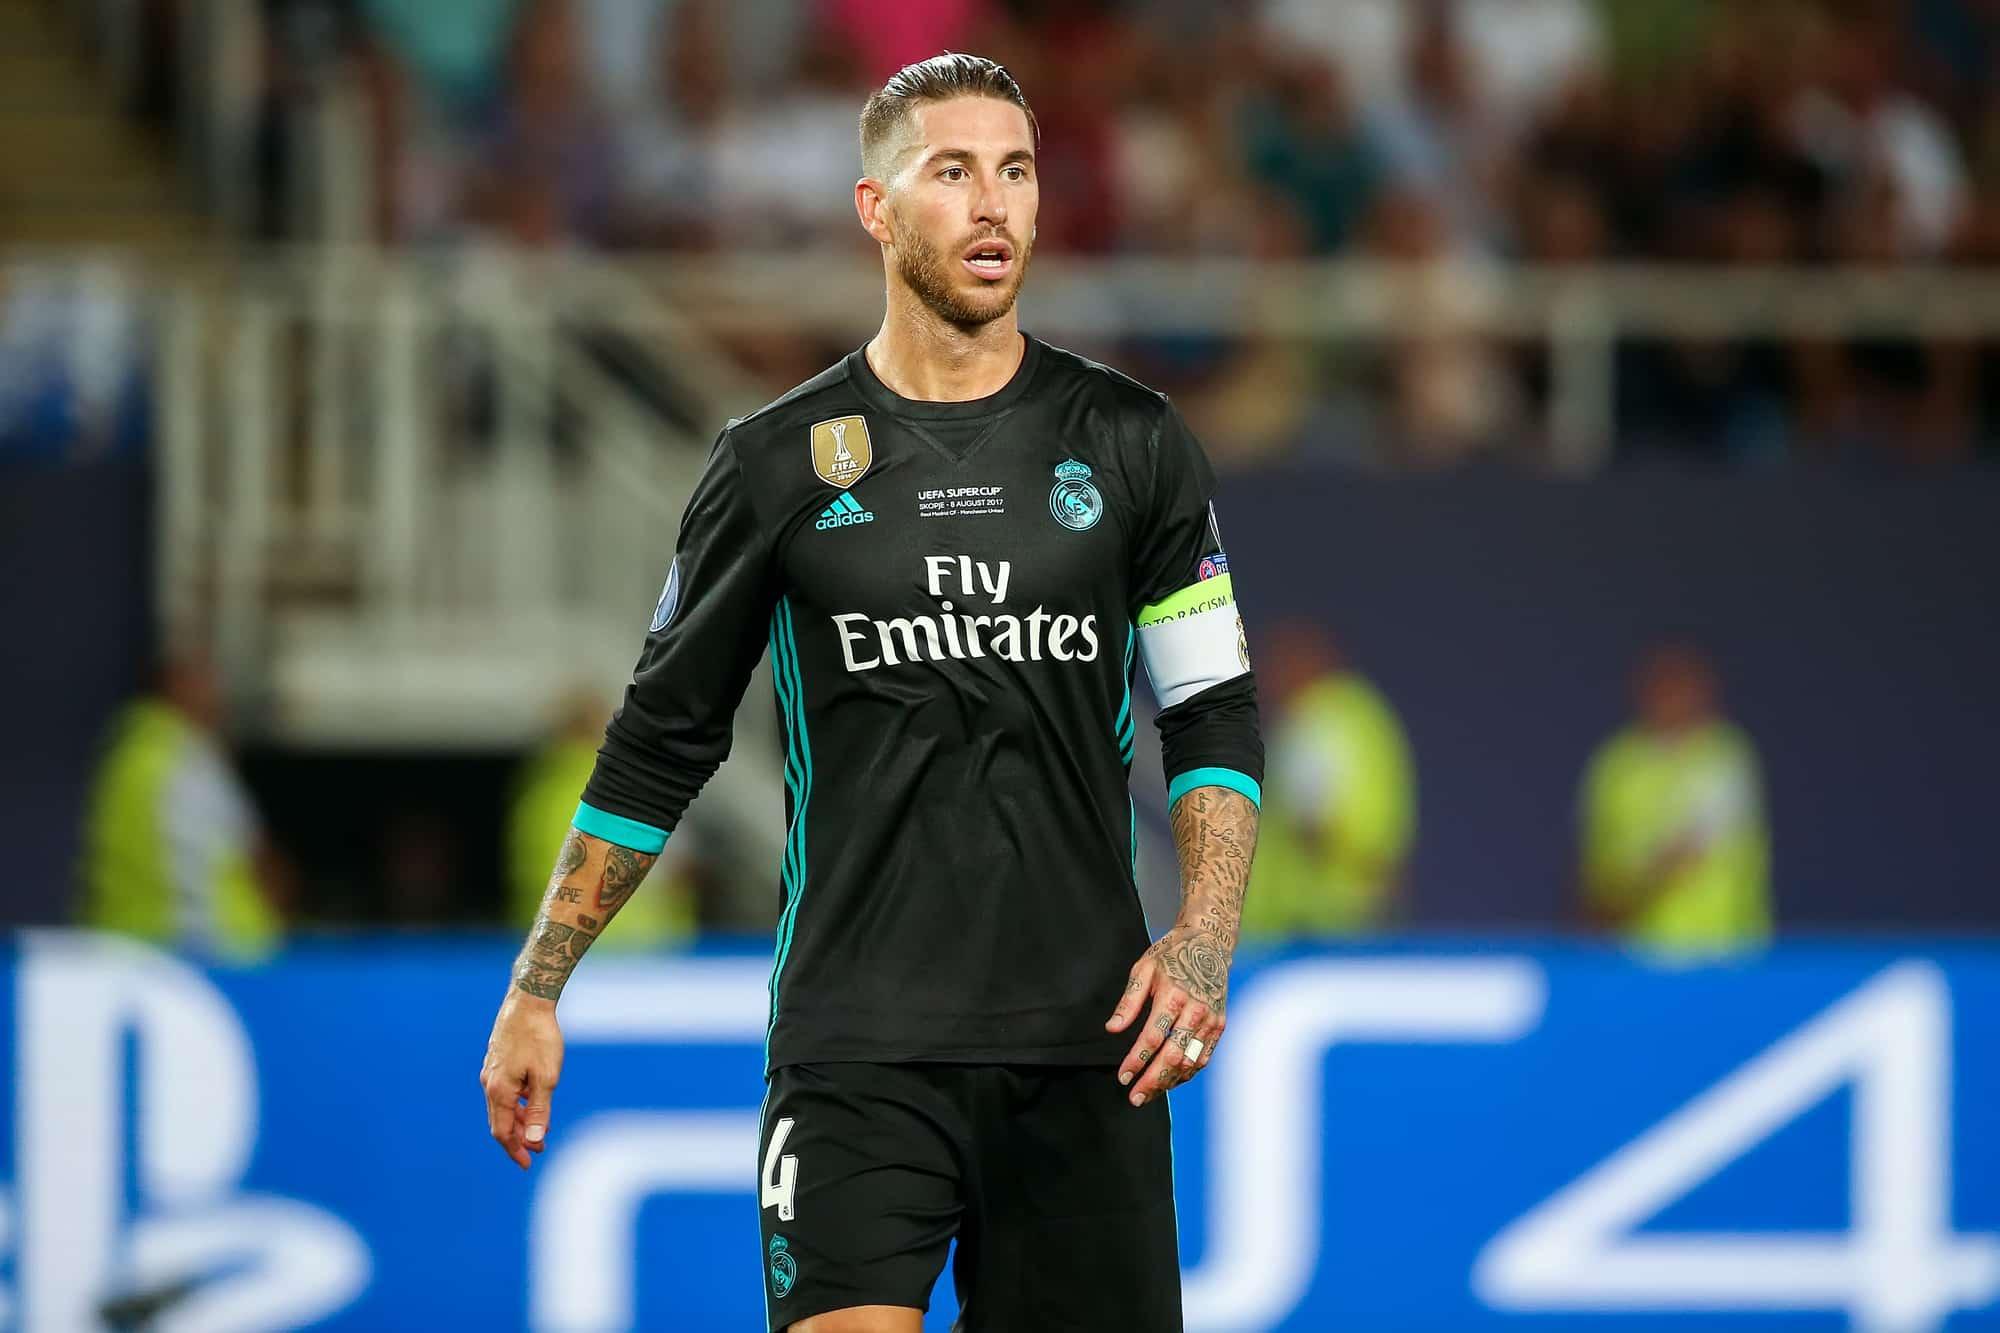 Sergio Ramos will be playing in the Real Madrid vs Borussia Monchengladbach